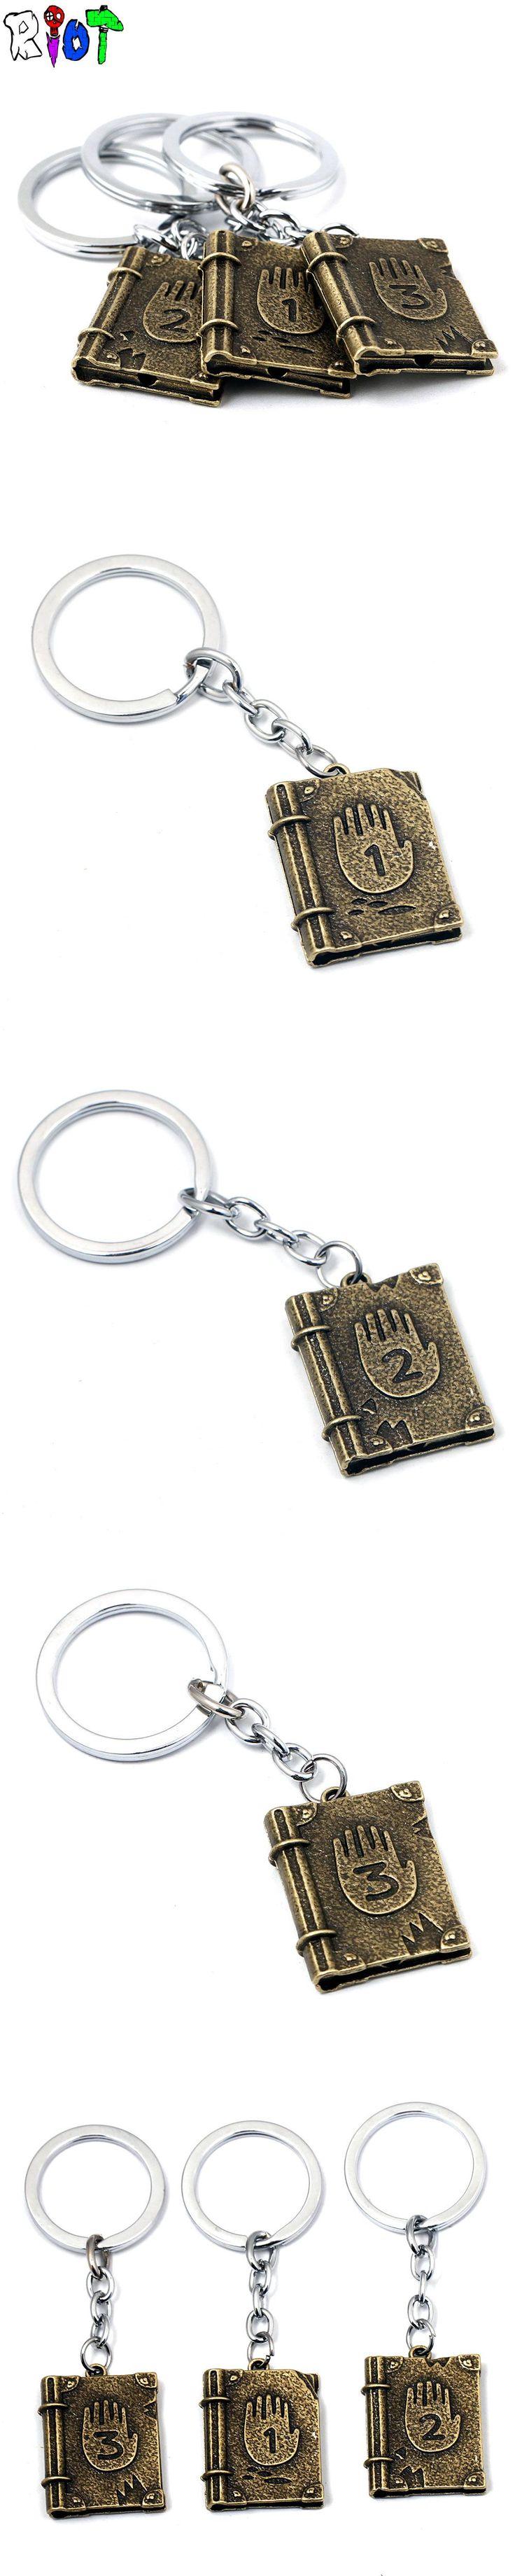 Gravity Falls Journal3 keychain Diepsloot diary LOGO alloly keyring Hard Back key chains children jewelry gift chaveiro necklace